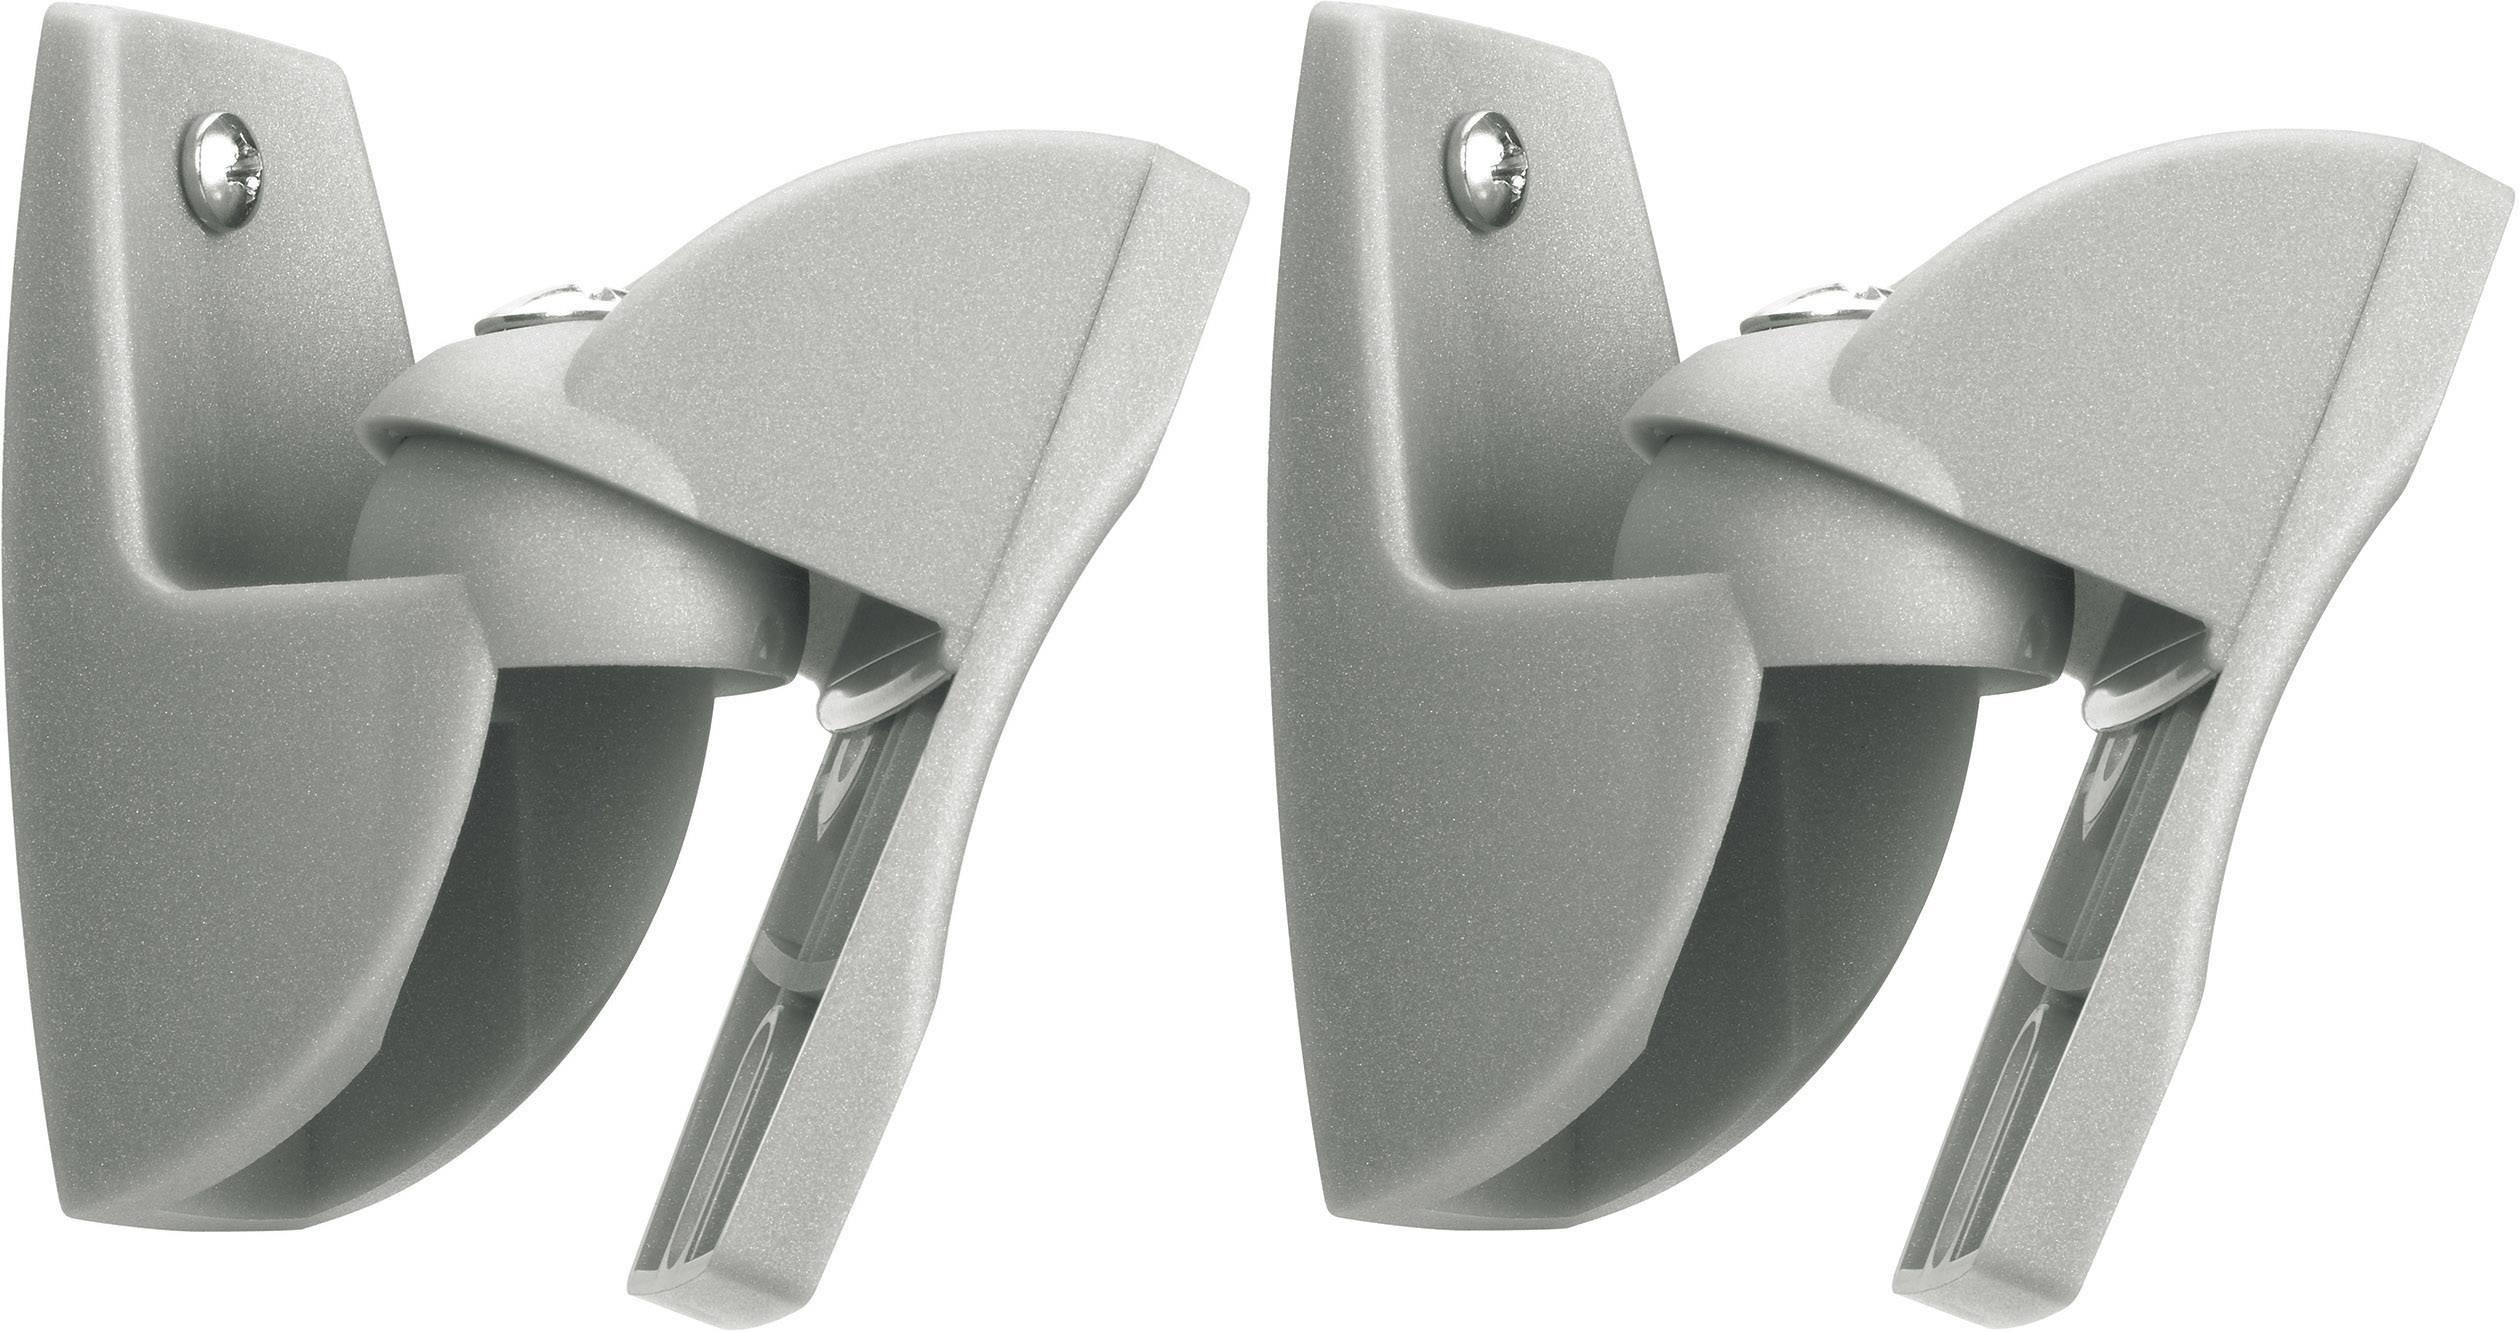 Držák na reproduktory Vogel´s VLB 500, stříbrná, 1 pár